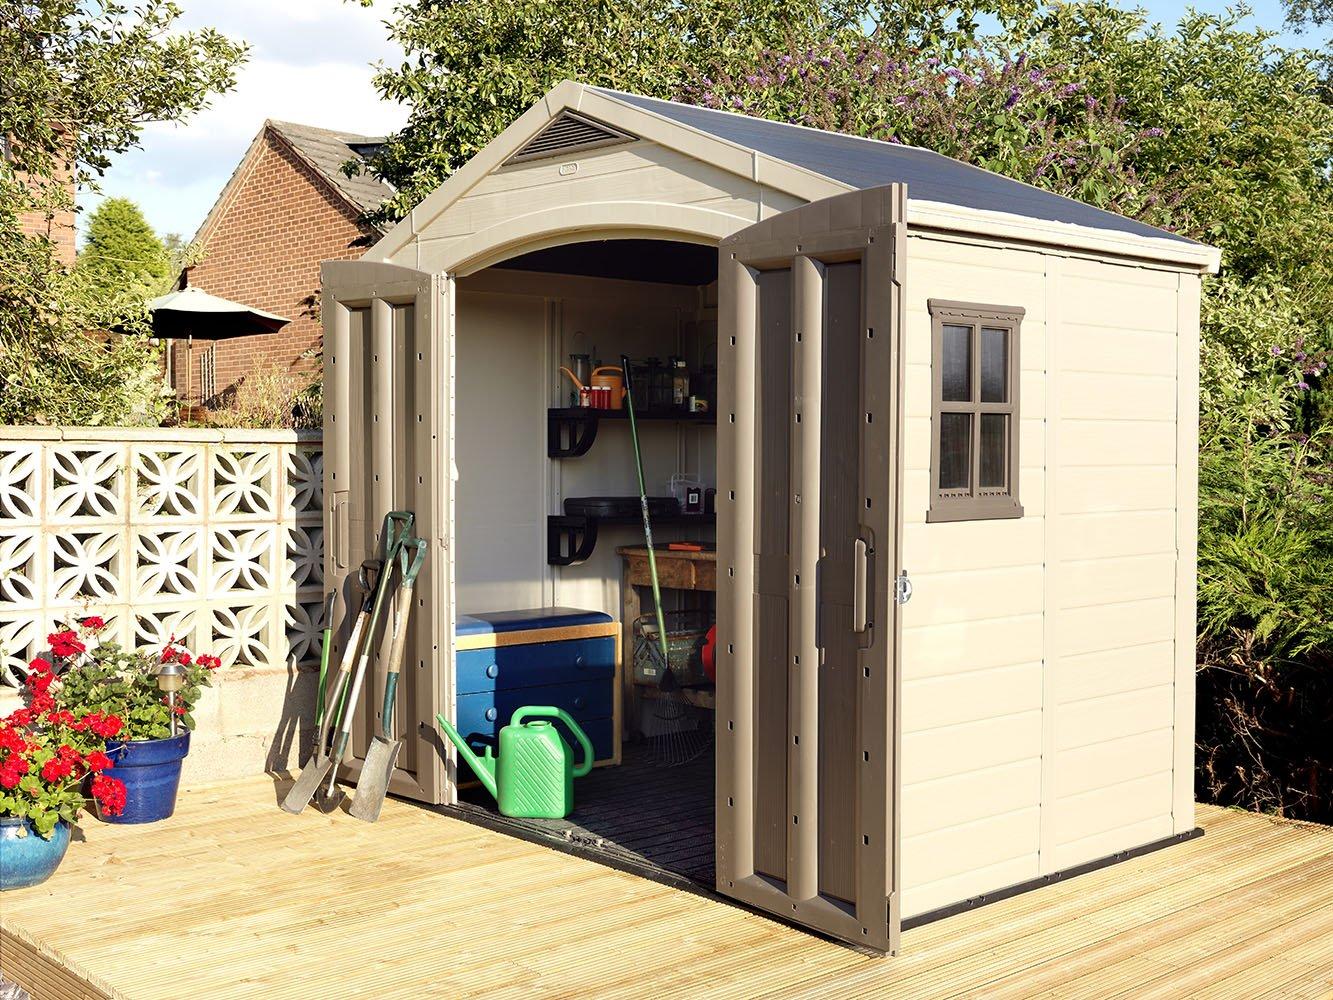 amazon com keter factor large 8 x 6 ft resin outdoor backyard